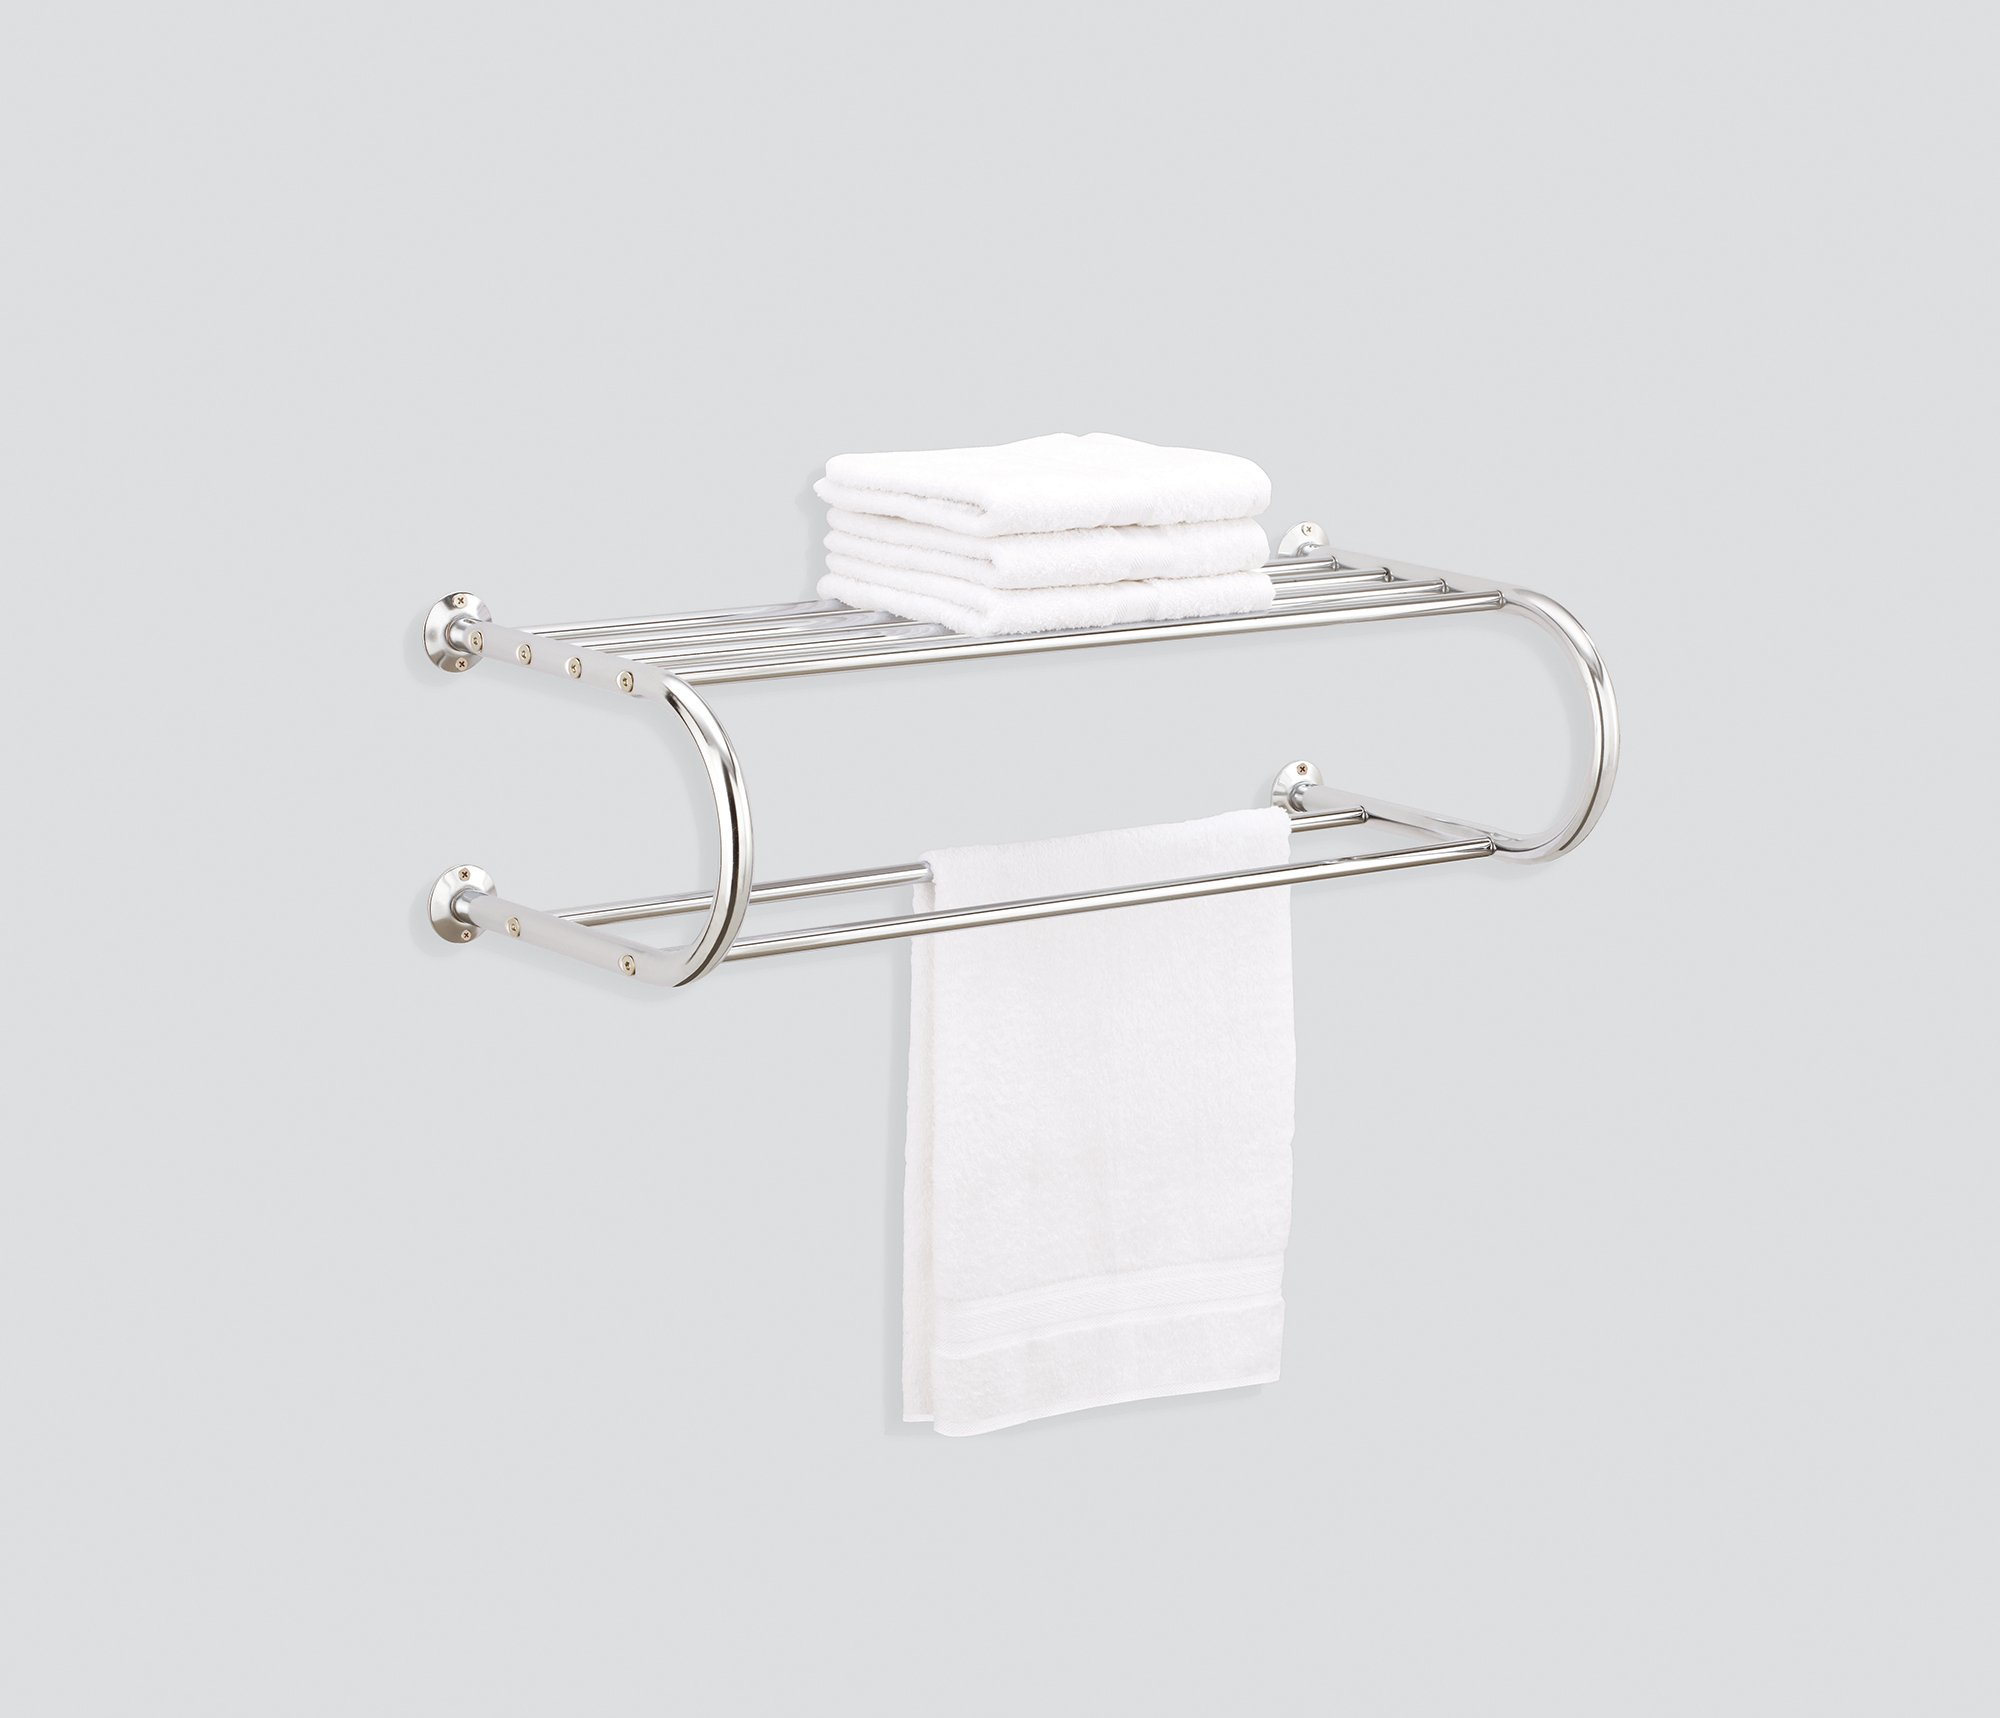 Organize It All Shelf Rack With Two Towel Bars Ebay